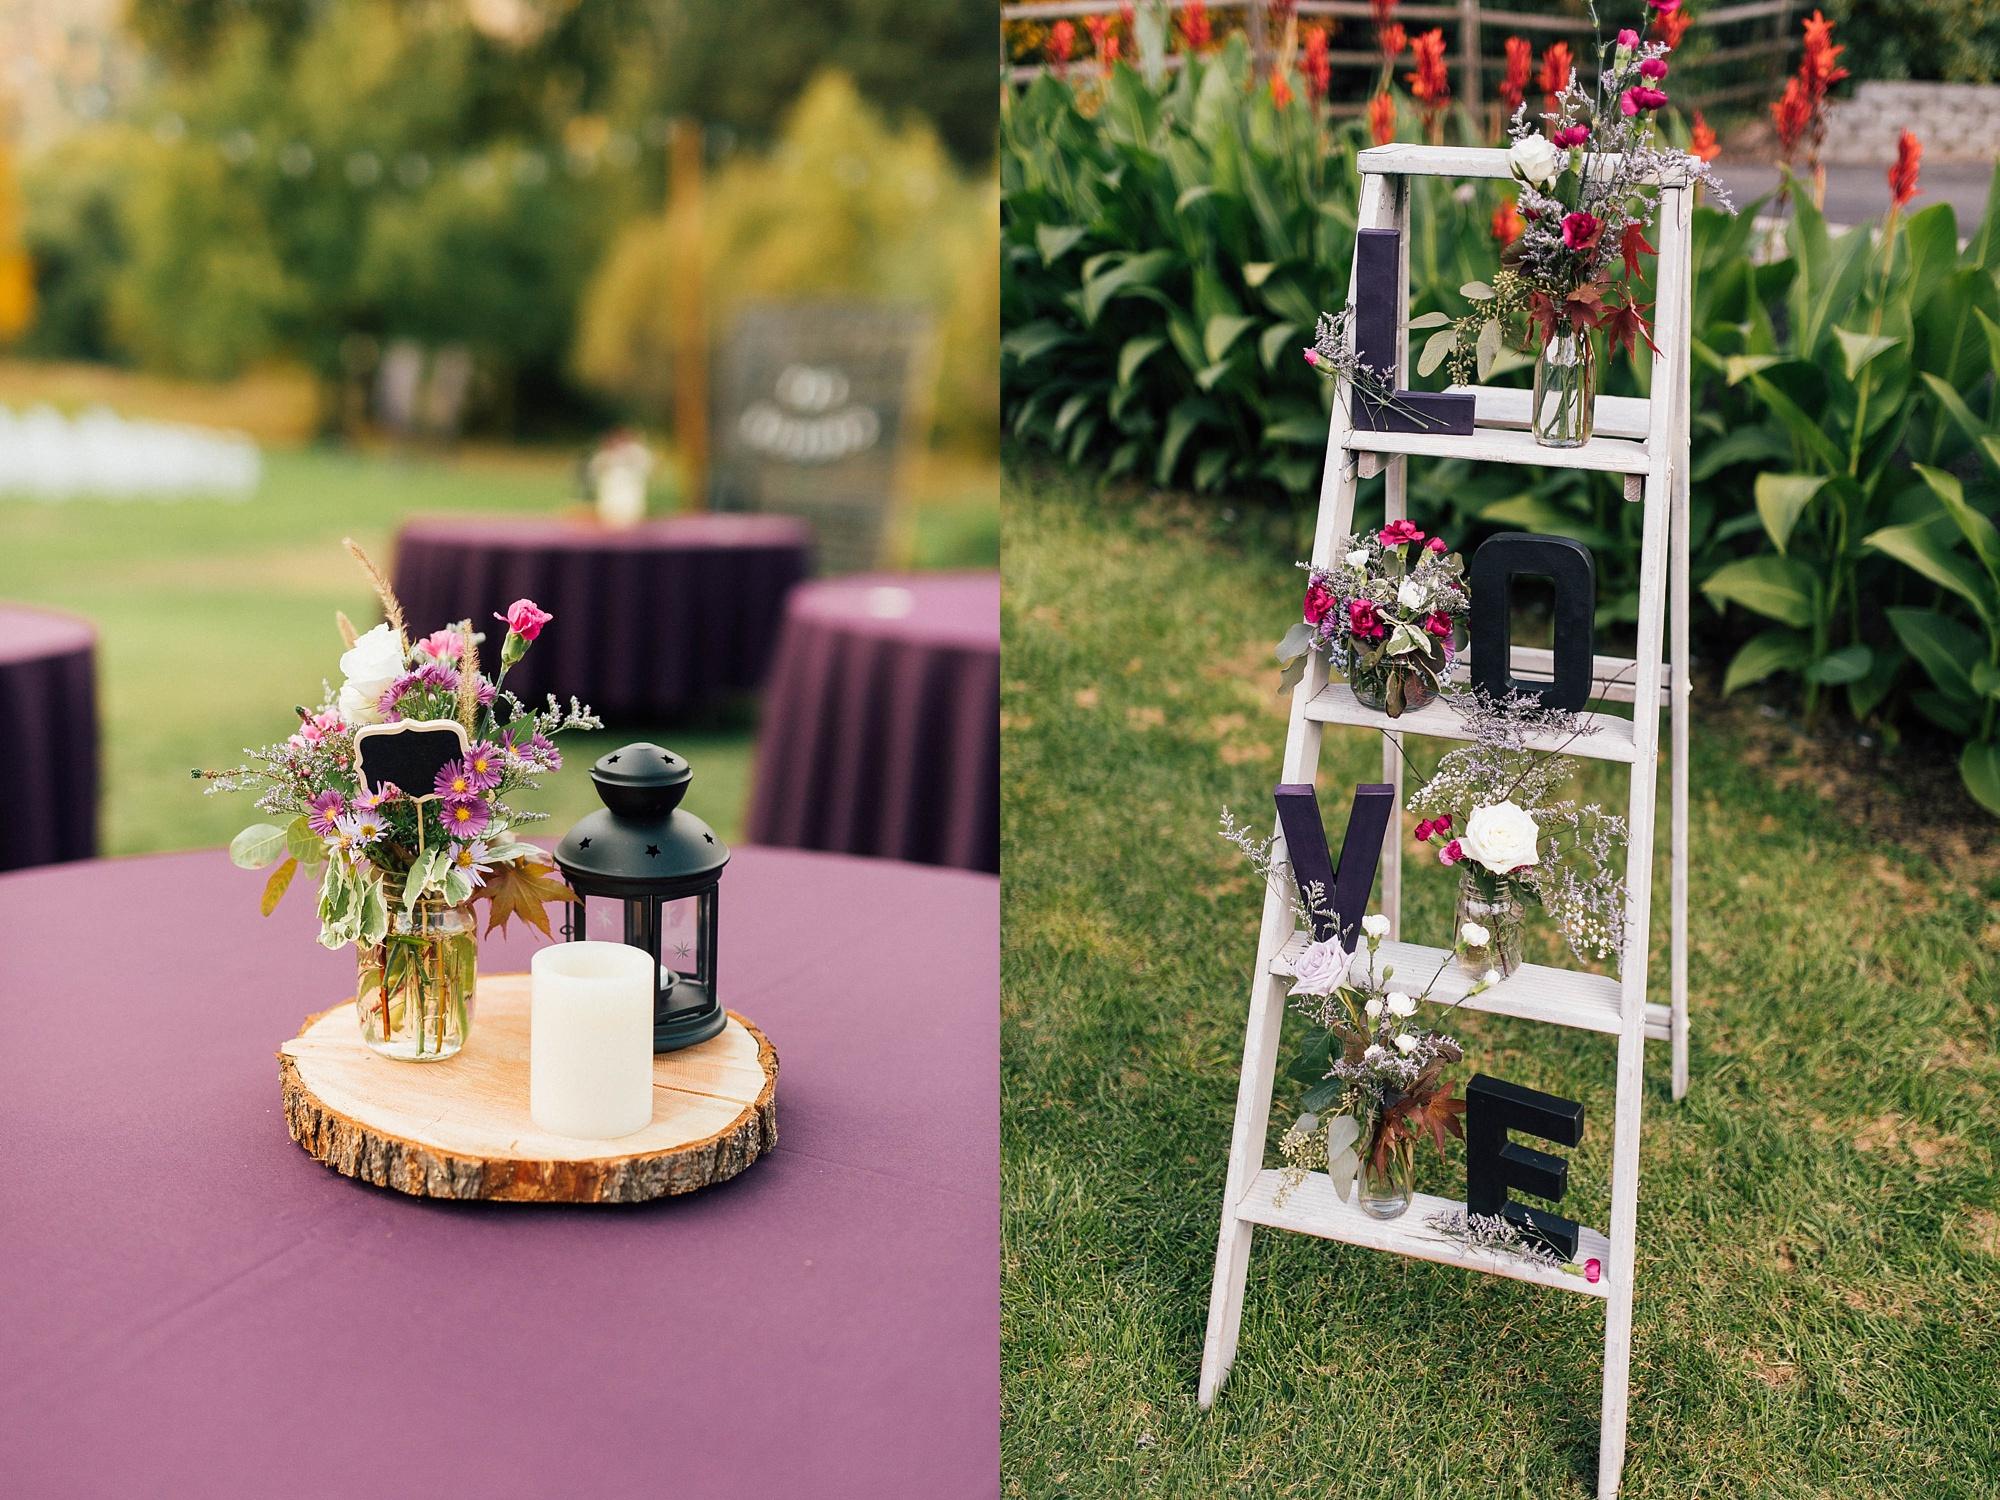 ashley_vos_seattle_ wedding_photographer_0231.jpg